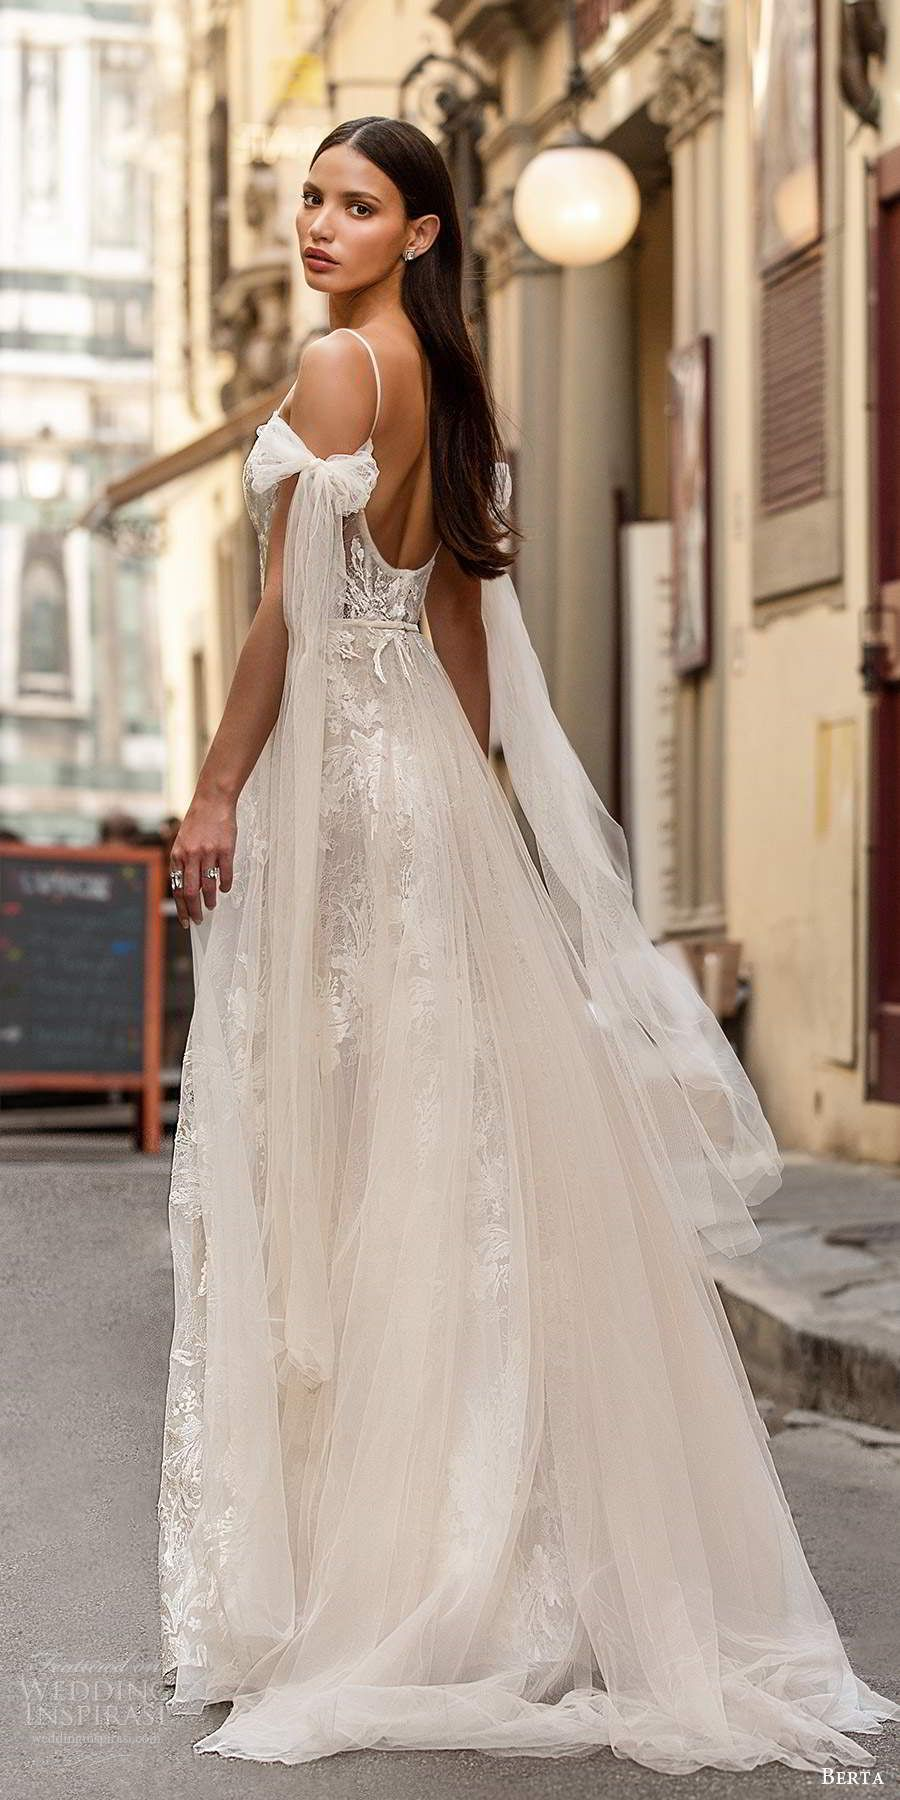 "Muse by Berta Herbst 2020 Brautkleider – Brautkollektion ""Florence""   – Đám cưới"